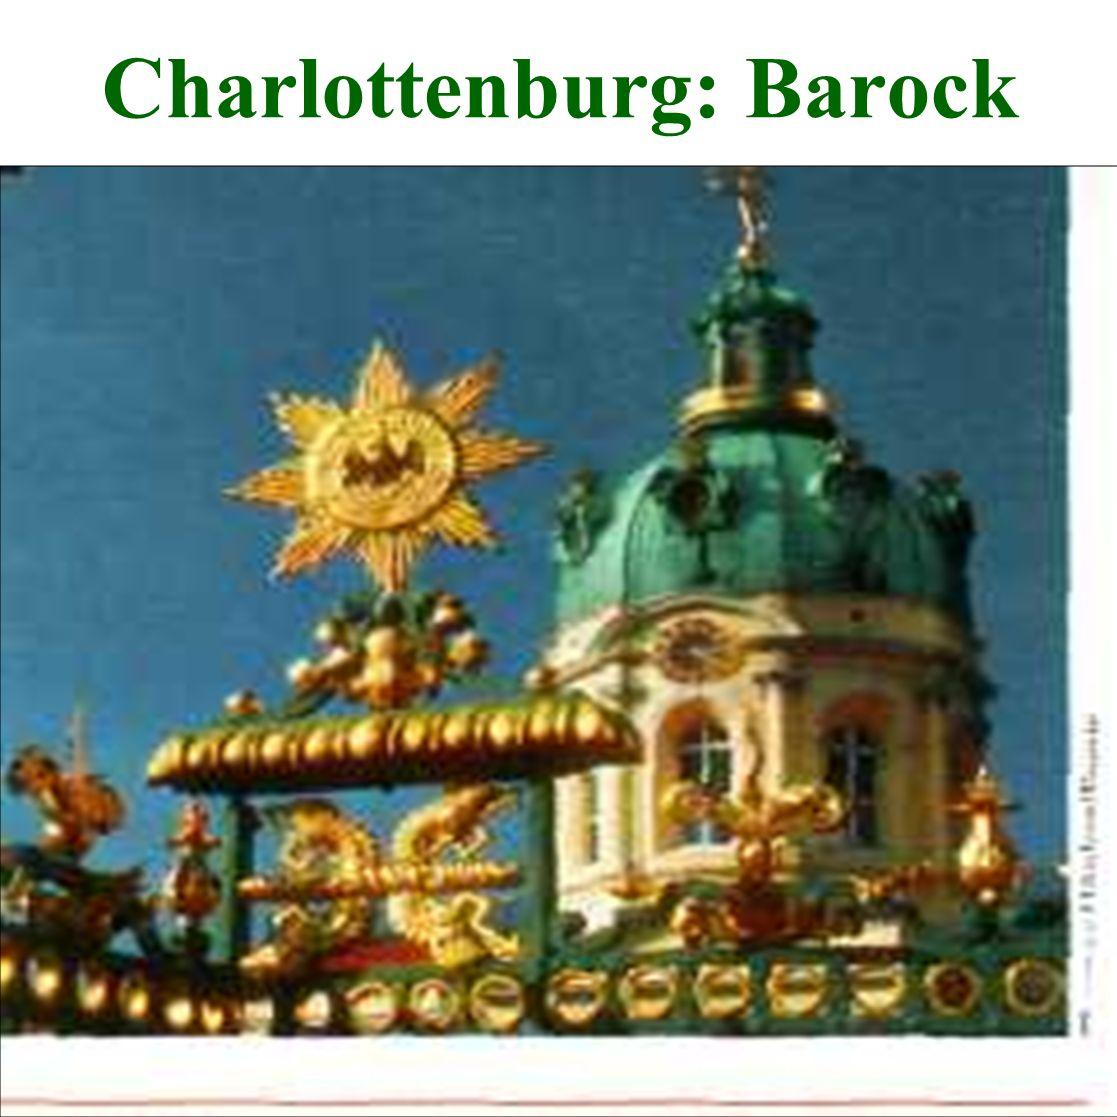 Charlottenburg: Barock